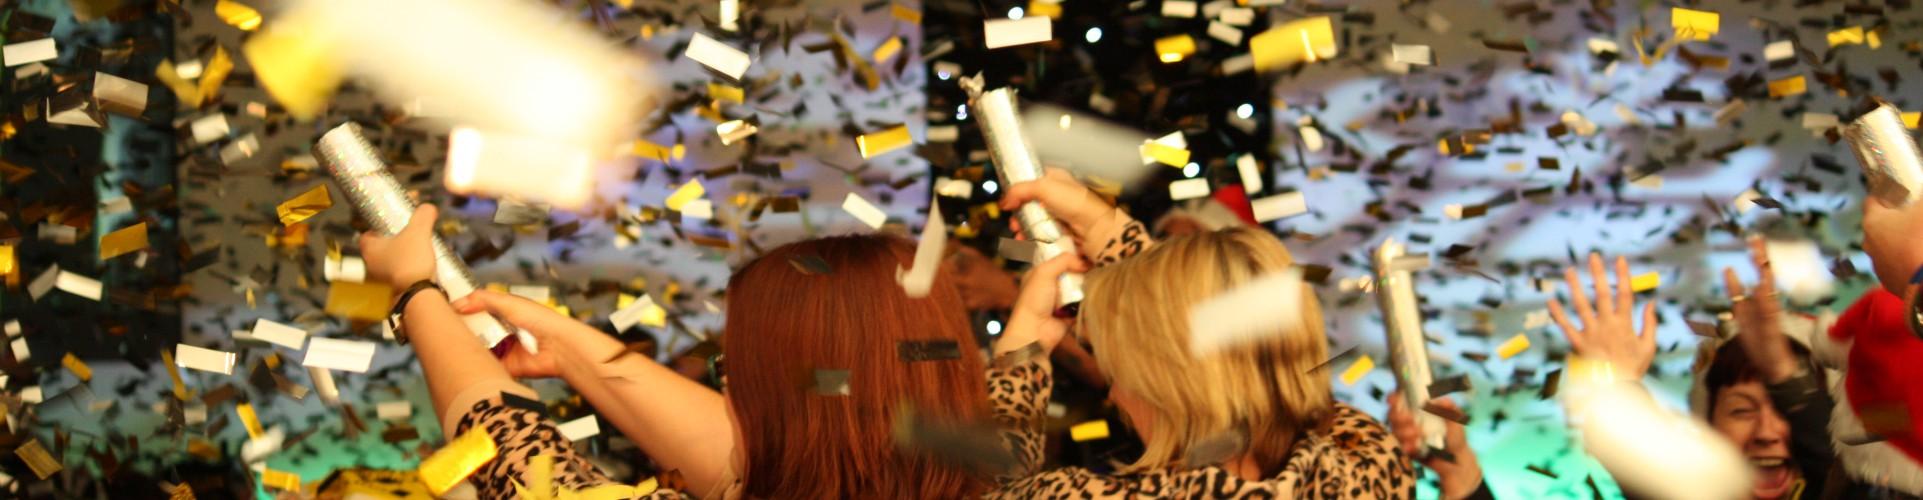 confetti cannons and gold glitter confetti at a party